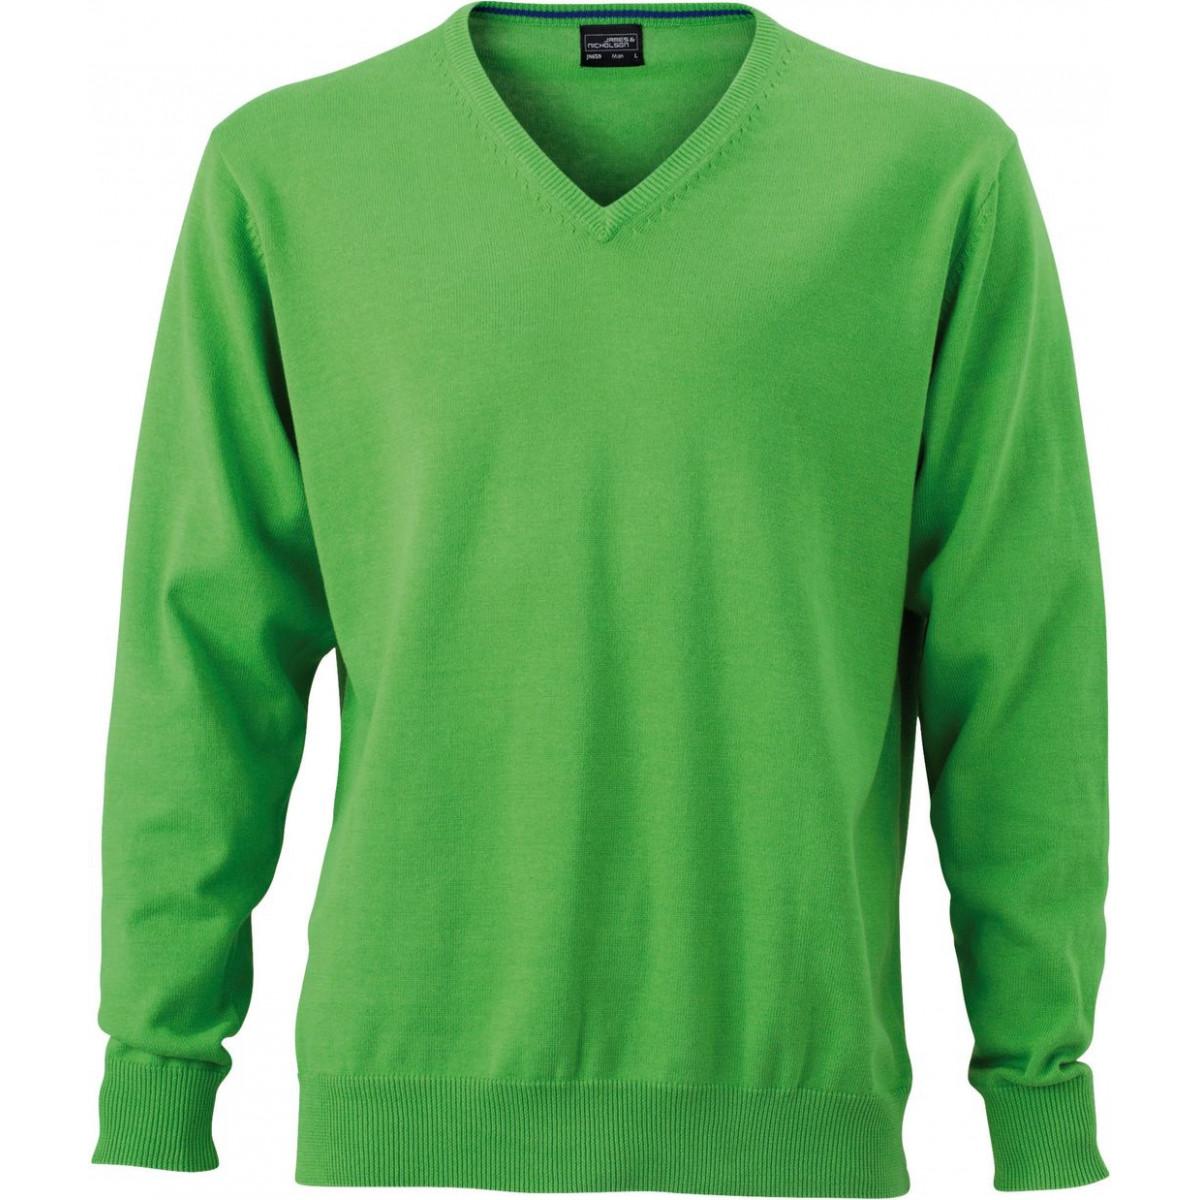 Пуловер мужской JN659 Mens V-Neck Pullover - Насыщенный зеленый